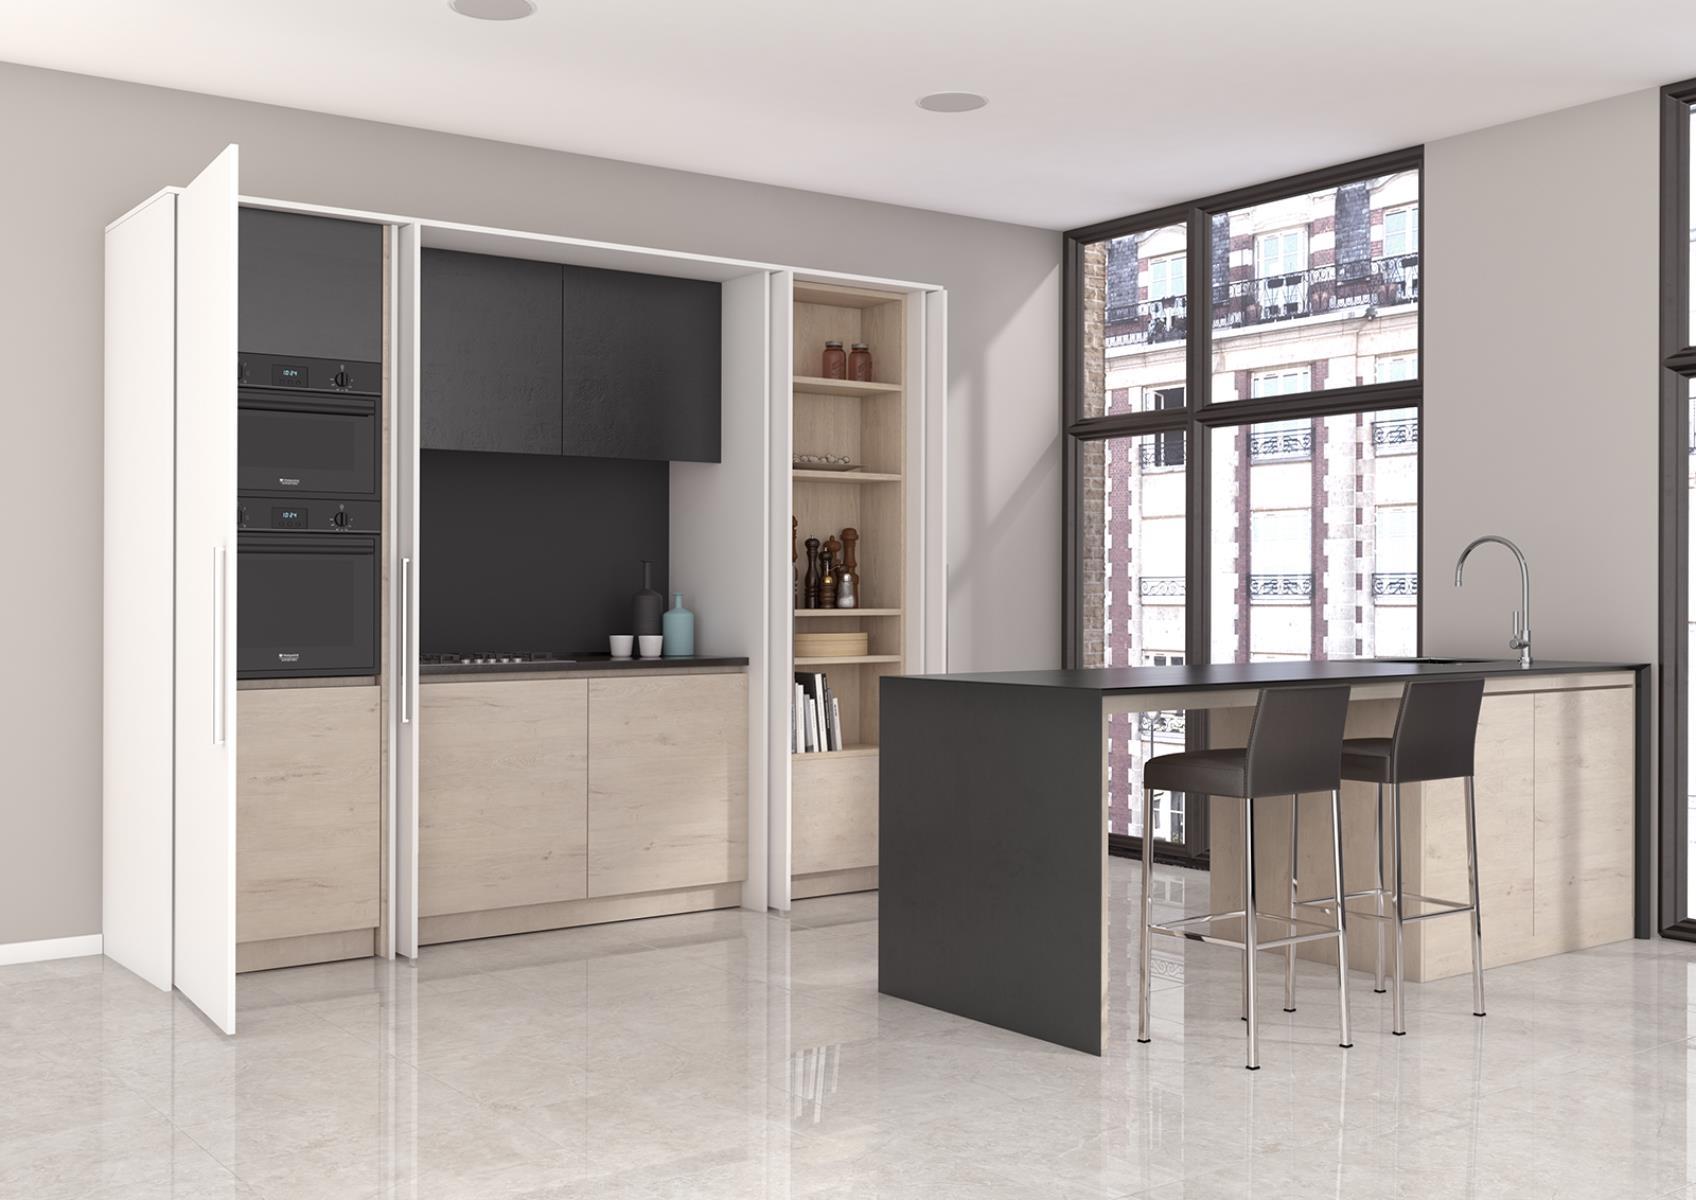 ardis-3d-render-para-modelado-de-muebles-3d